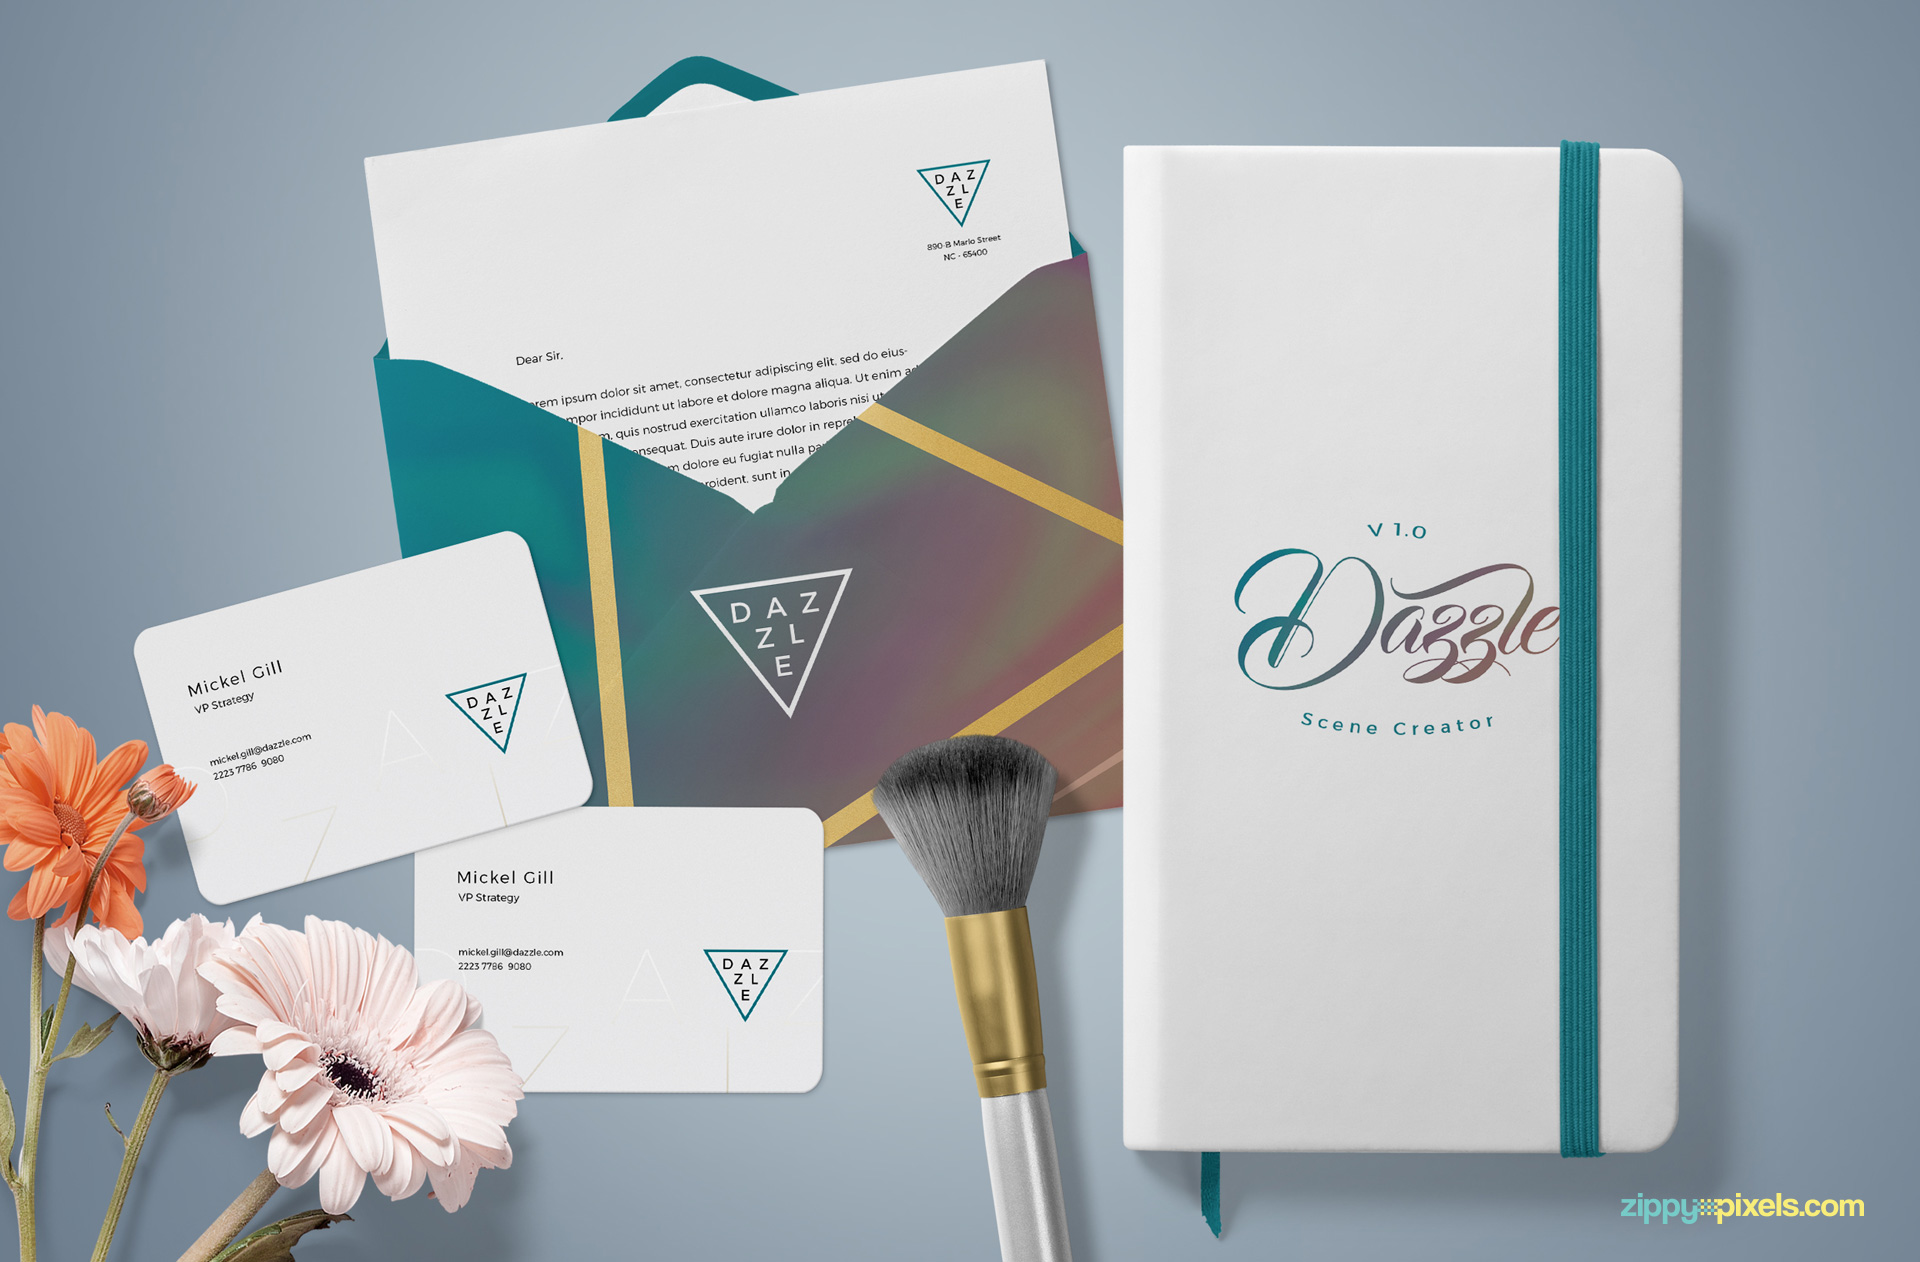 dazzle-scene-diary-envelope-cards-01